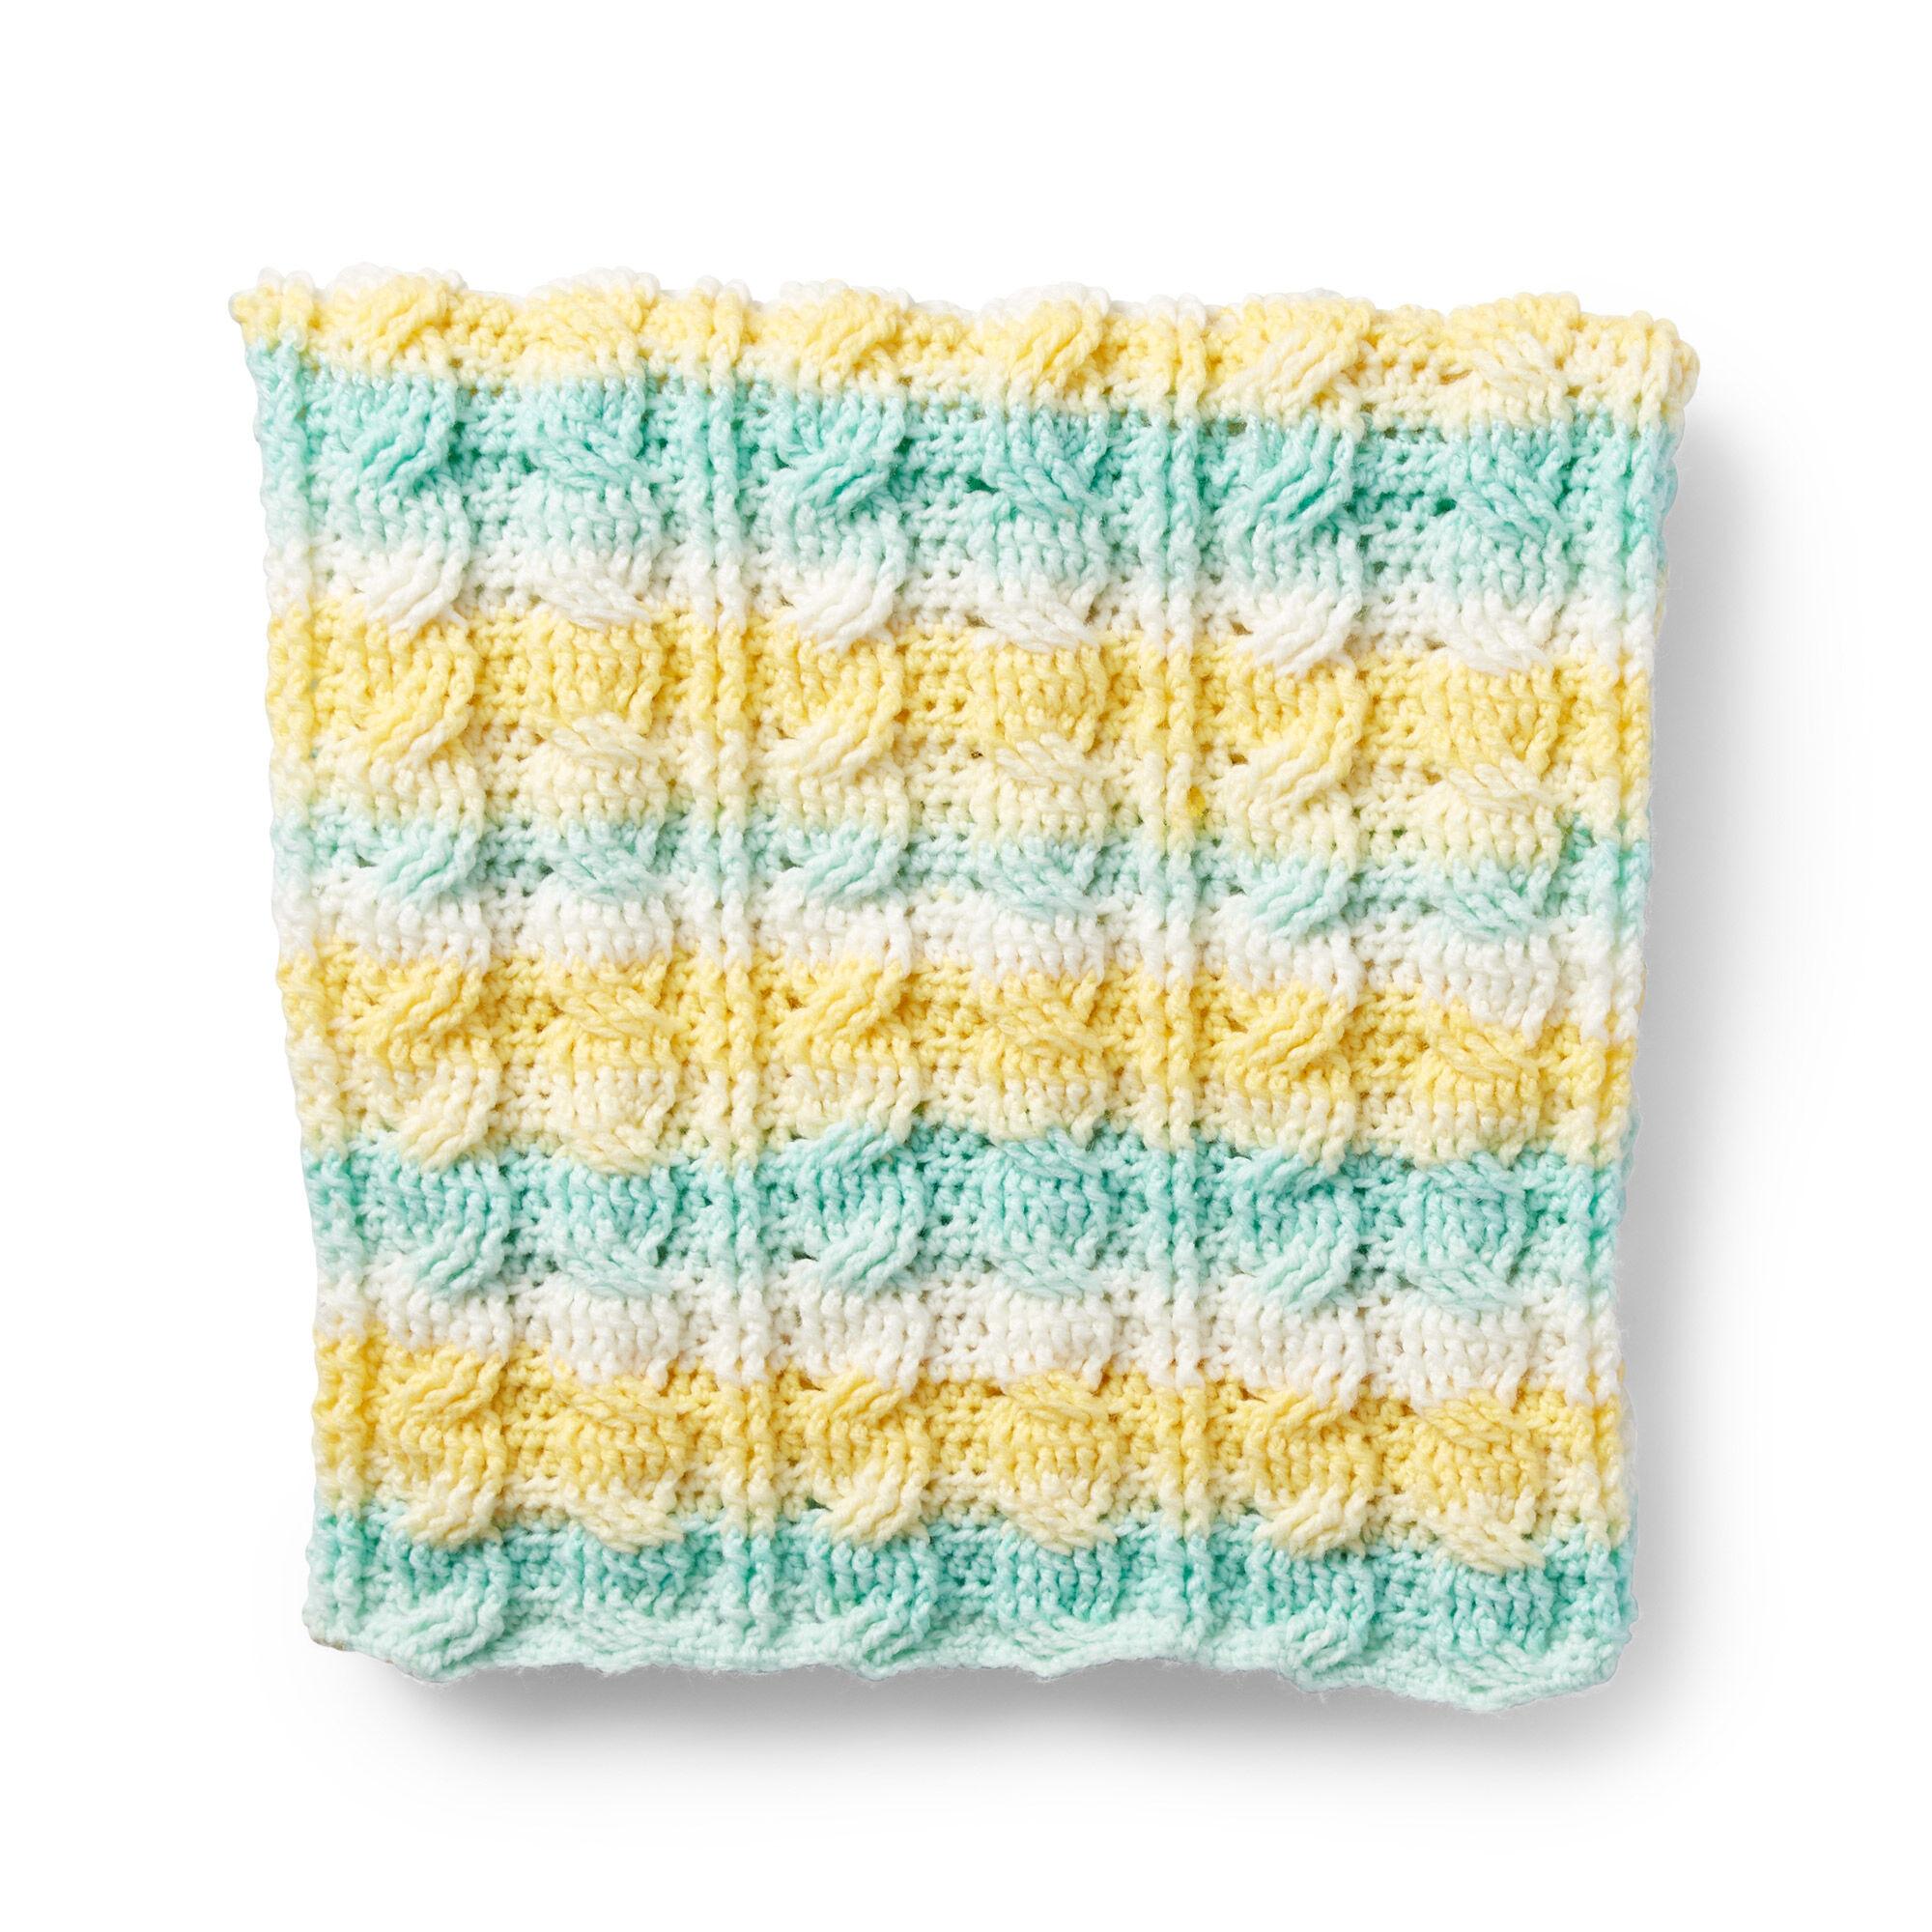 Caron Citrus Cables Crochet Baby Blanket Pattern Yarnspirations